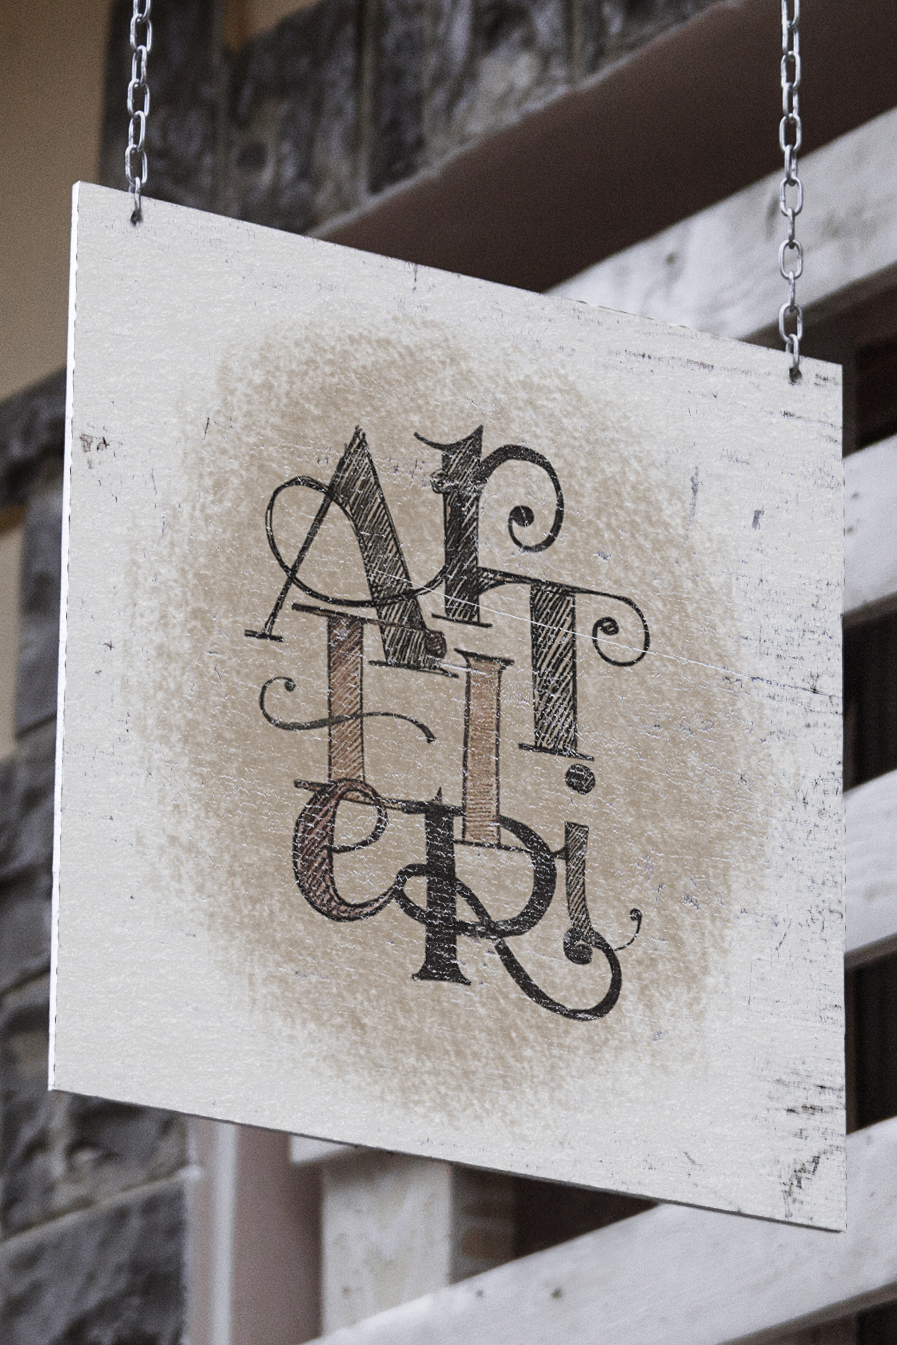 Artelier Signage